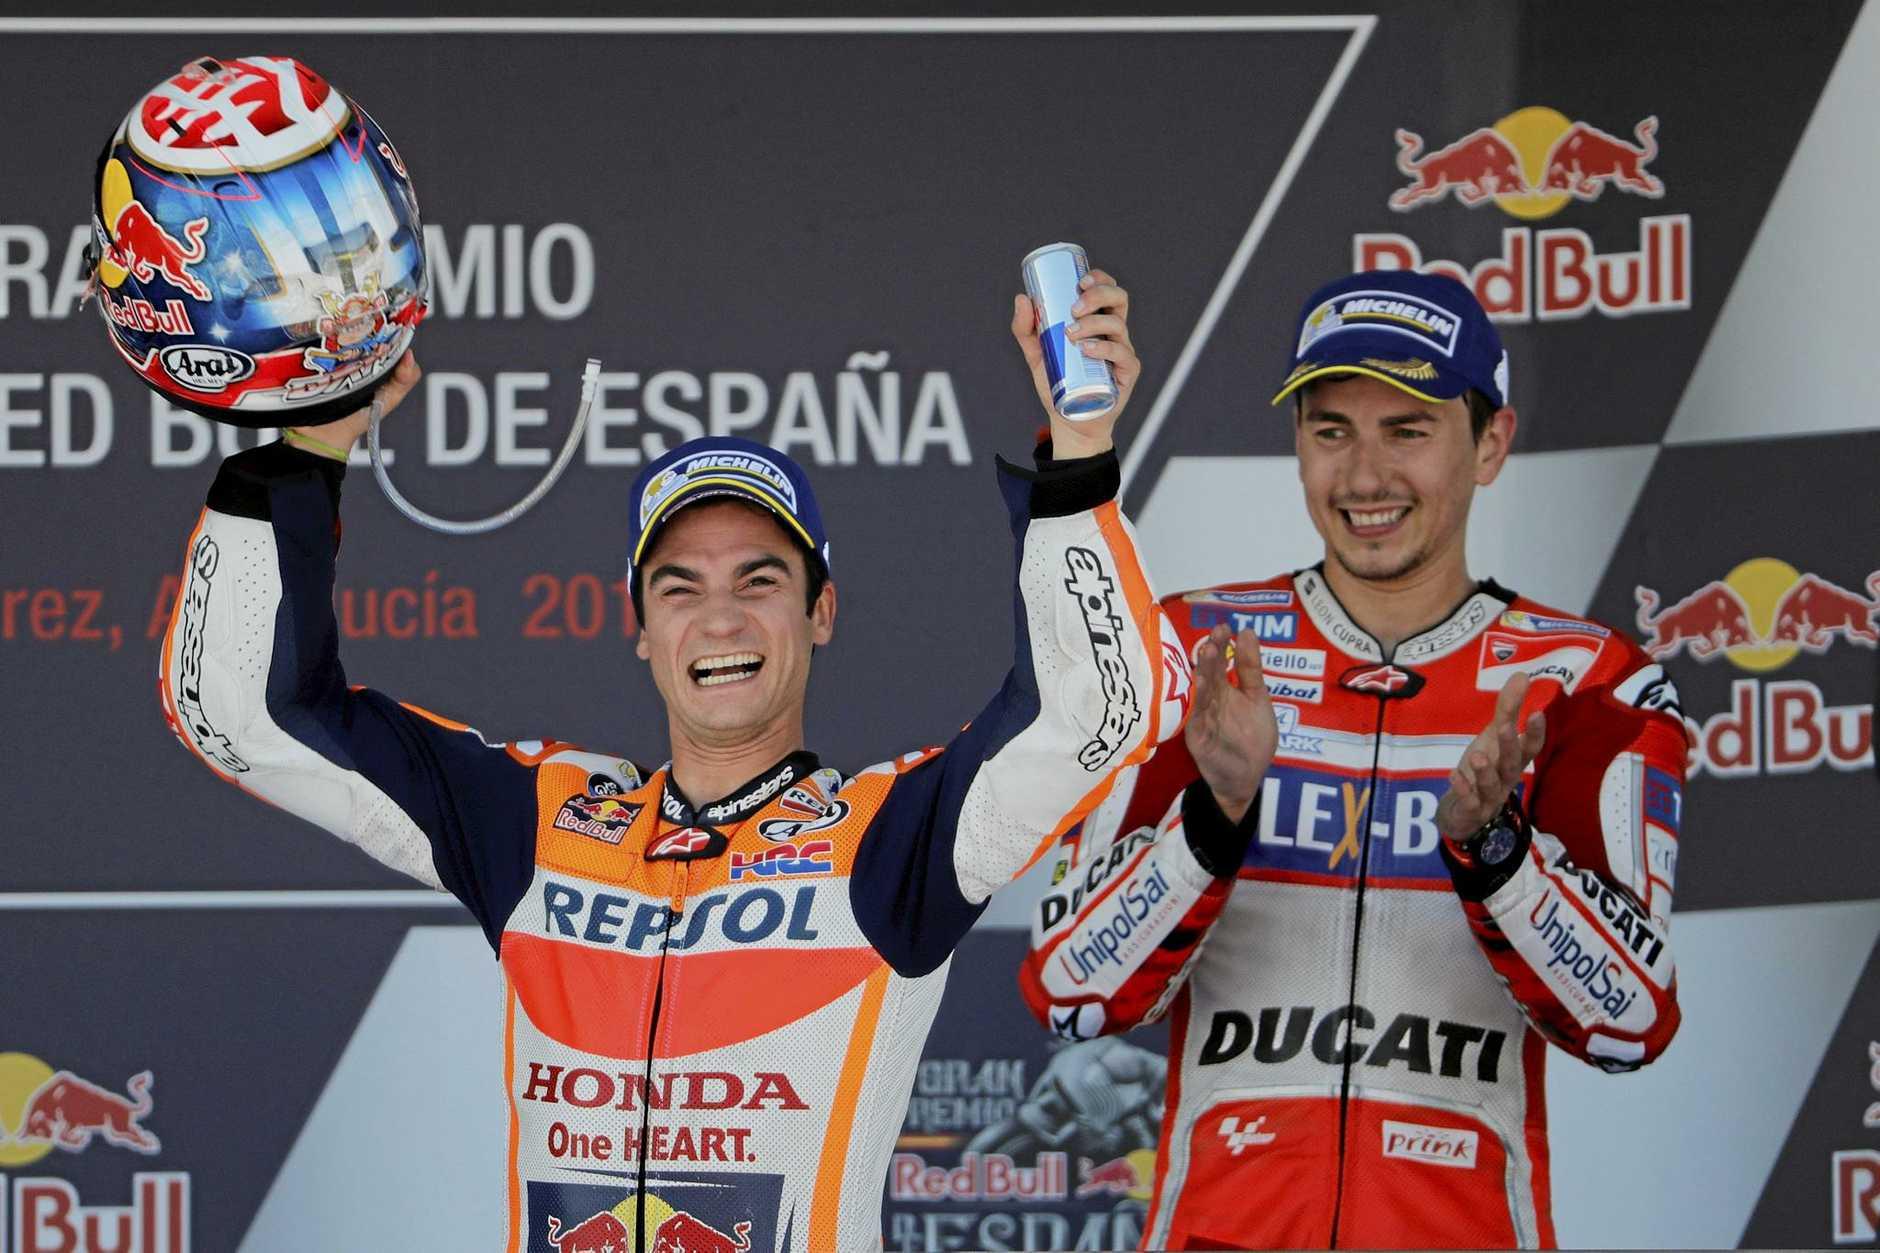 MotoGP race winner Dani Pedrosa of Spain celebrates at the Spanish Motorcycle Grand Prix.